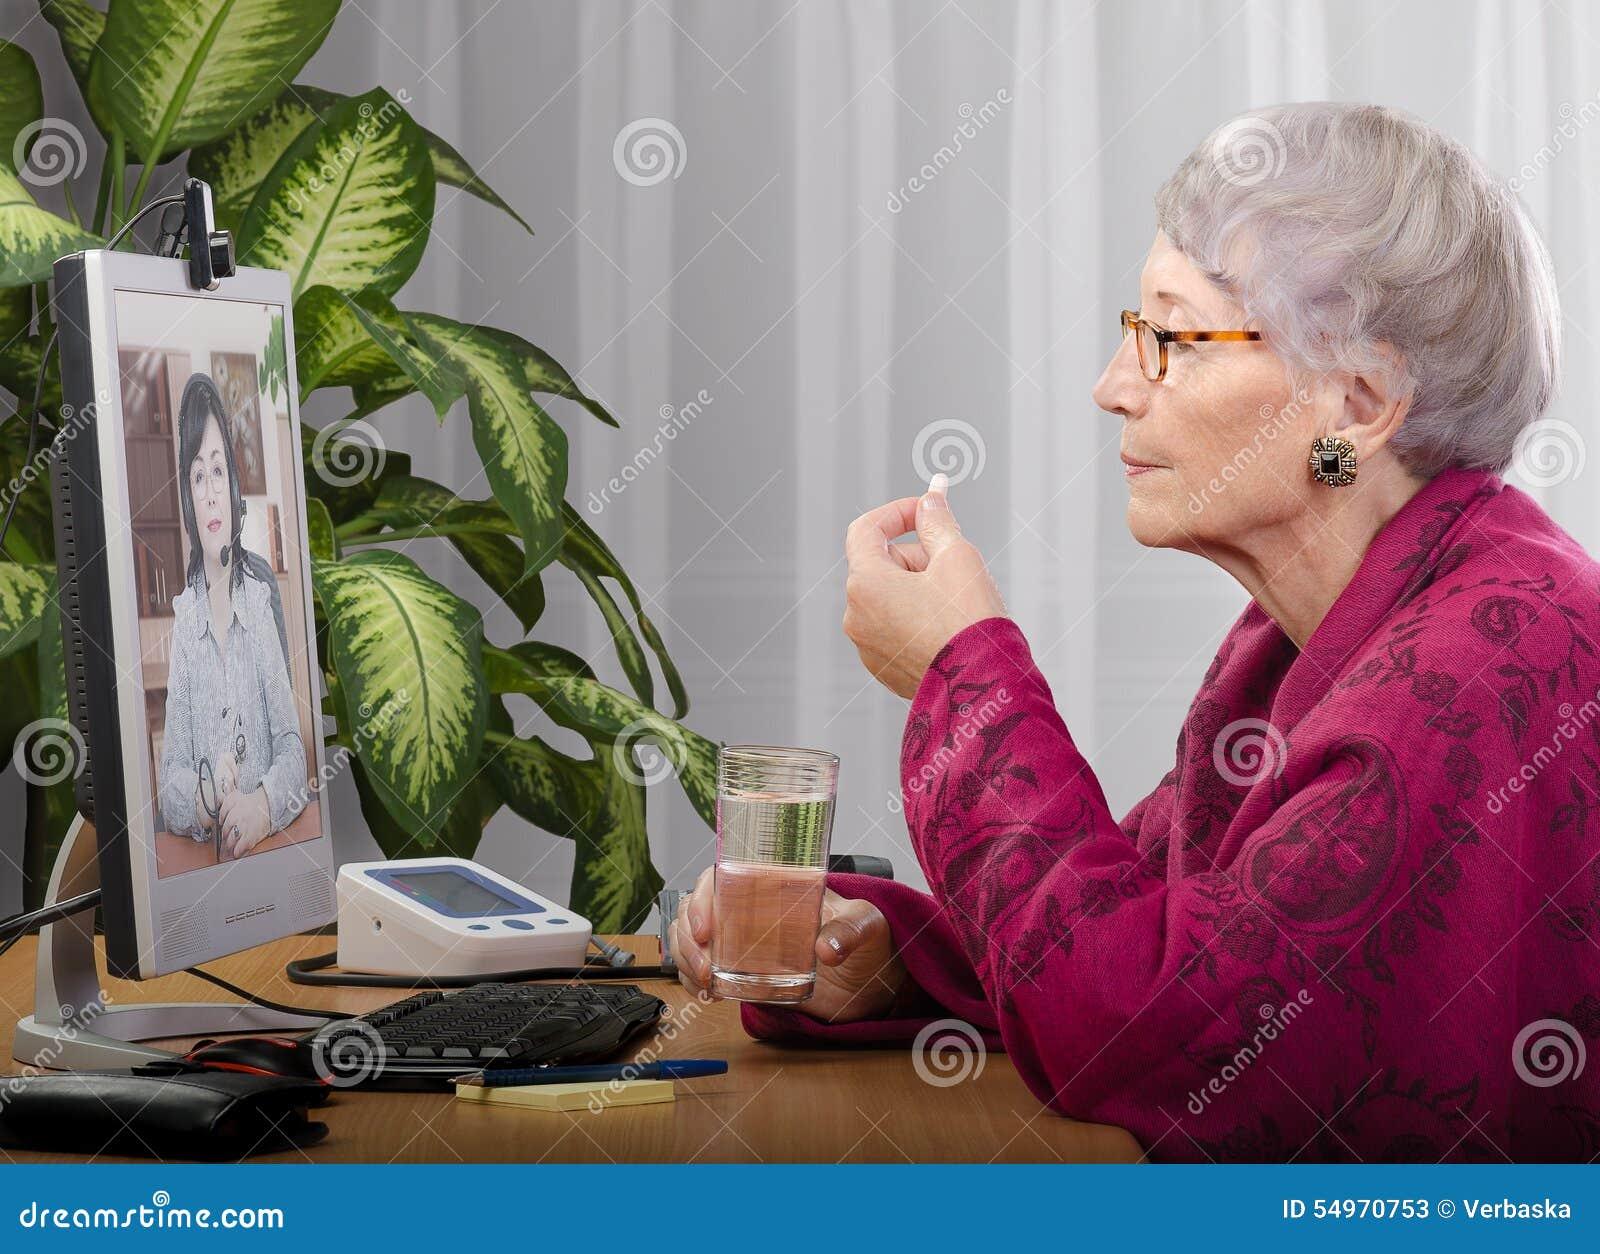 taking tablet during virtual doctor visit stock photo image 54970753. Black Bedroom Furniture Sets. Home Design Ideas